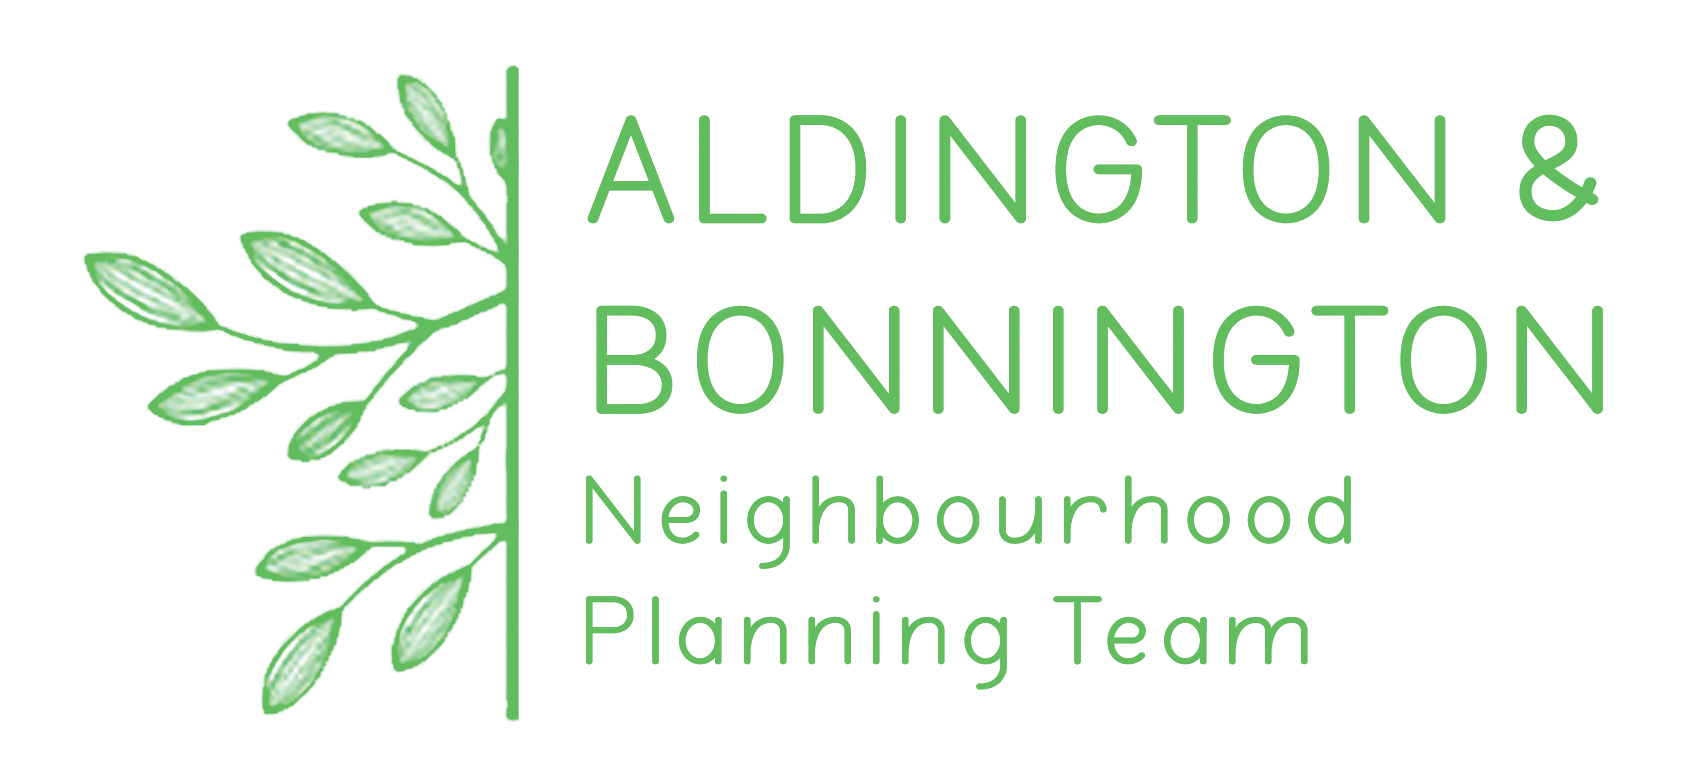 Aldington & Bonnington Neighbourhood Plan